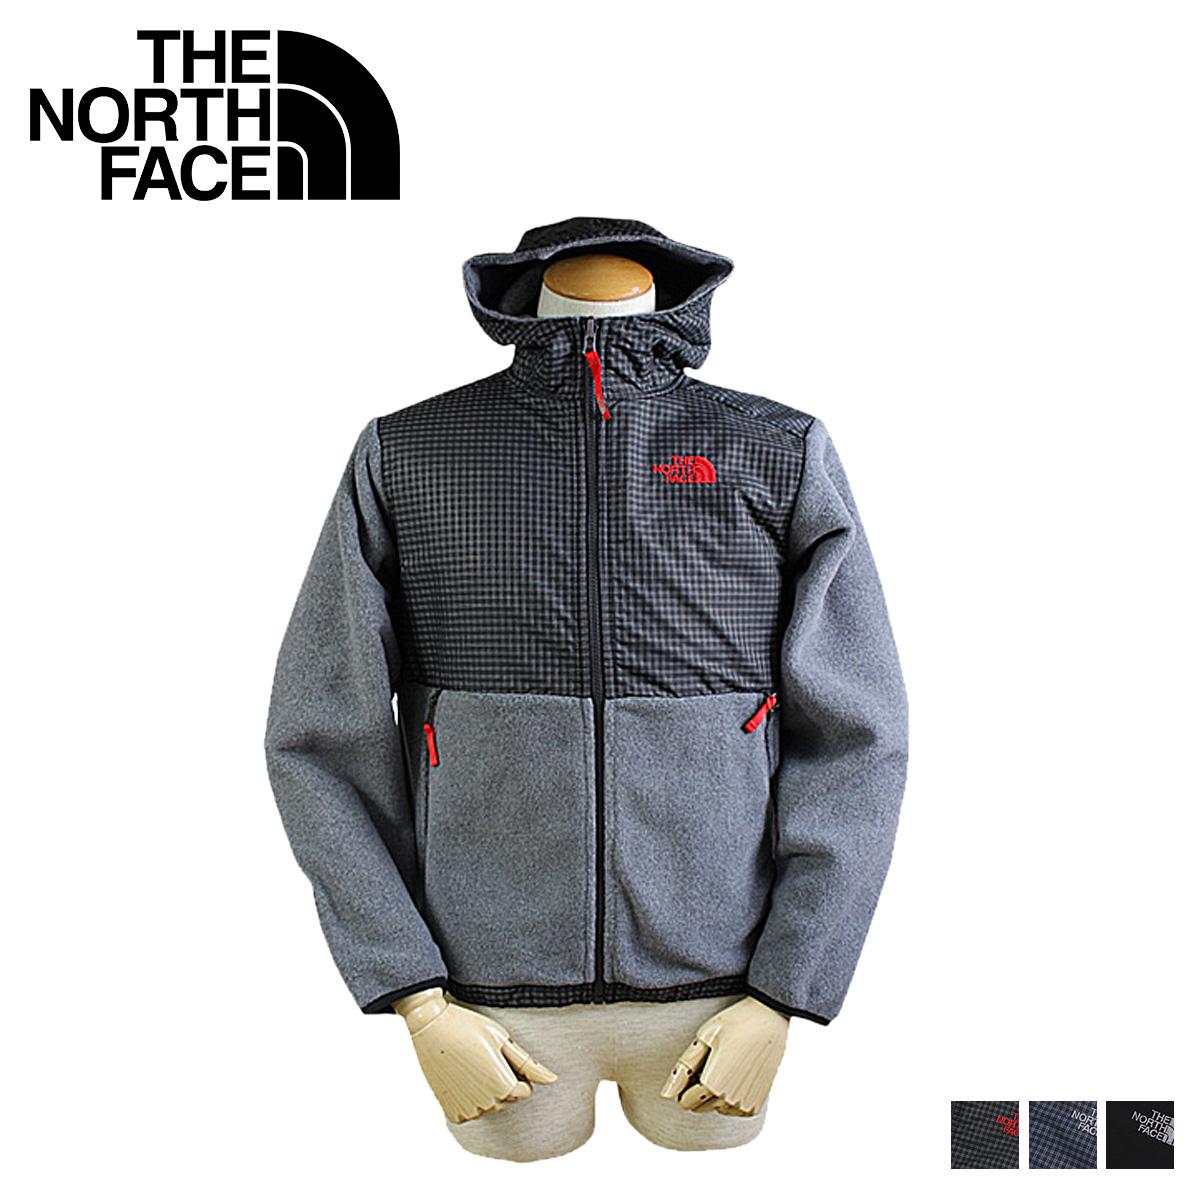 739f5e4a4a ... closeout the north face the north face kids ladys fleece jacket 3  colors aqgc boys denali